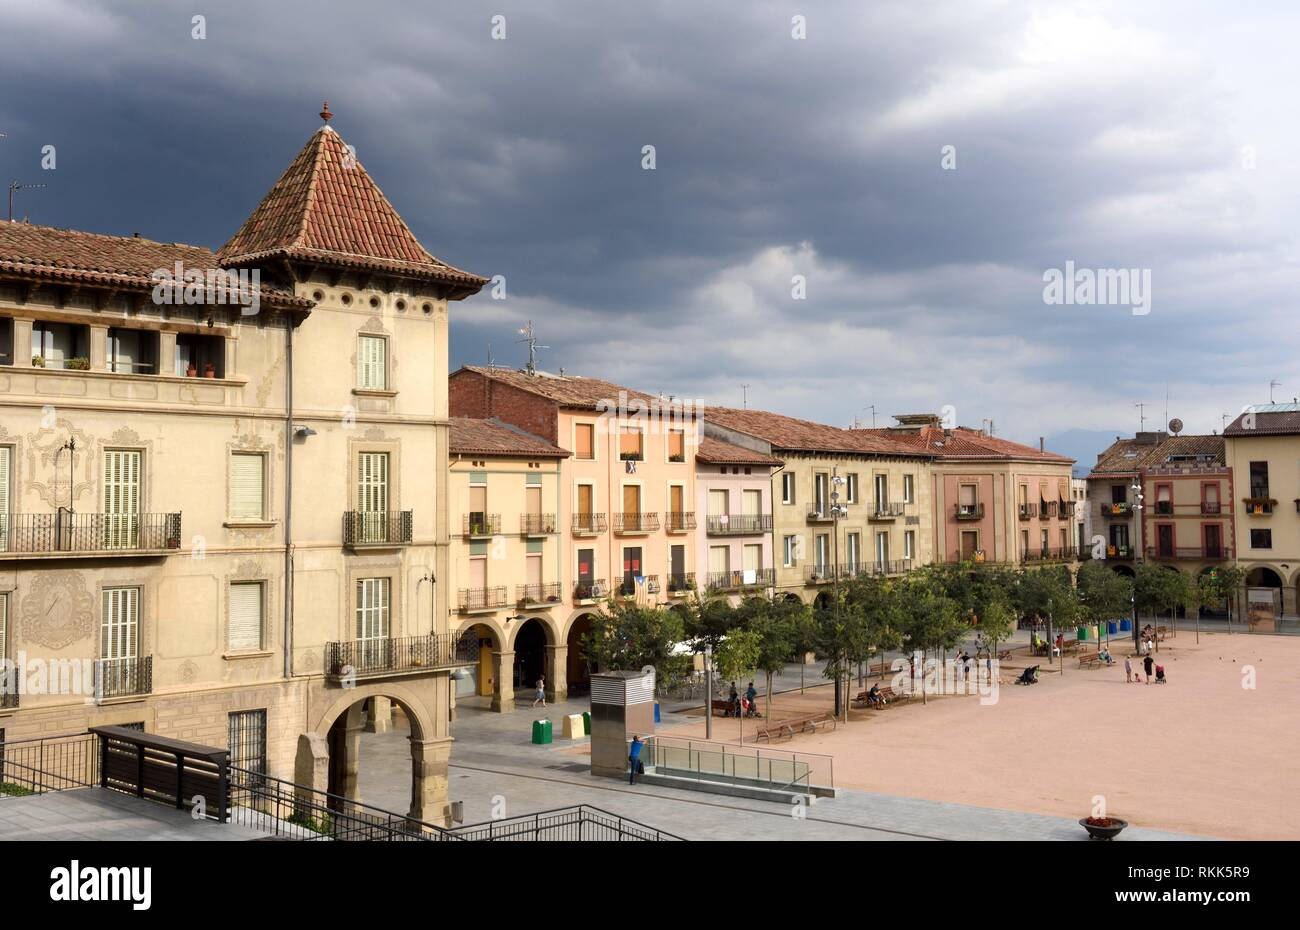 square of Manlleu, Barcelona province, Catalonia, Spain. - Stock Image